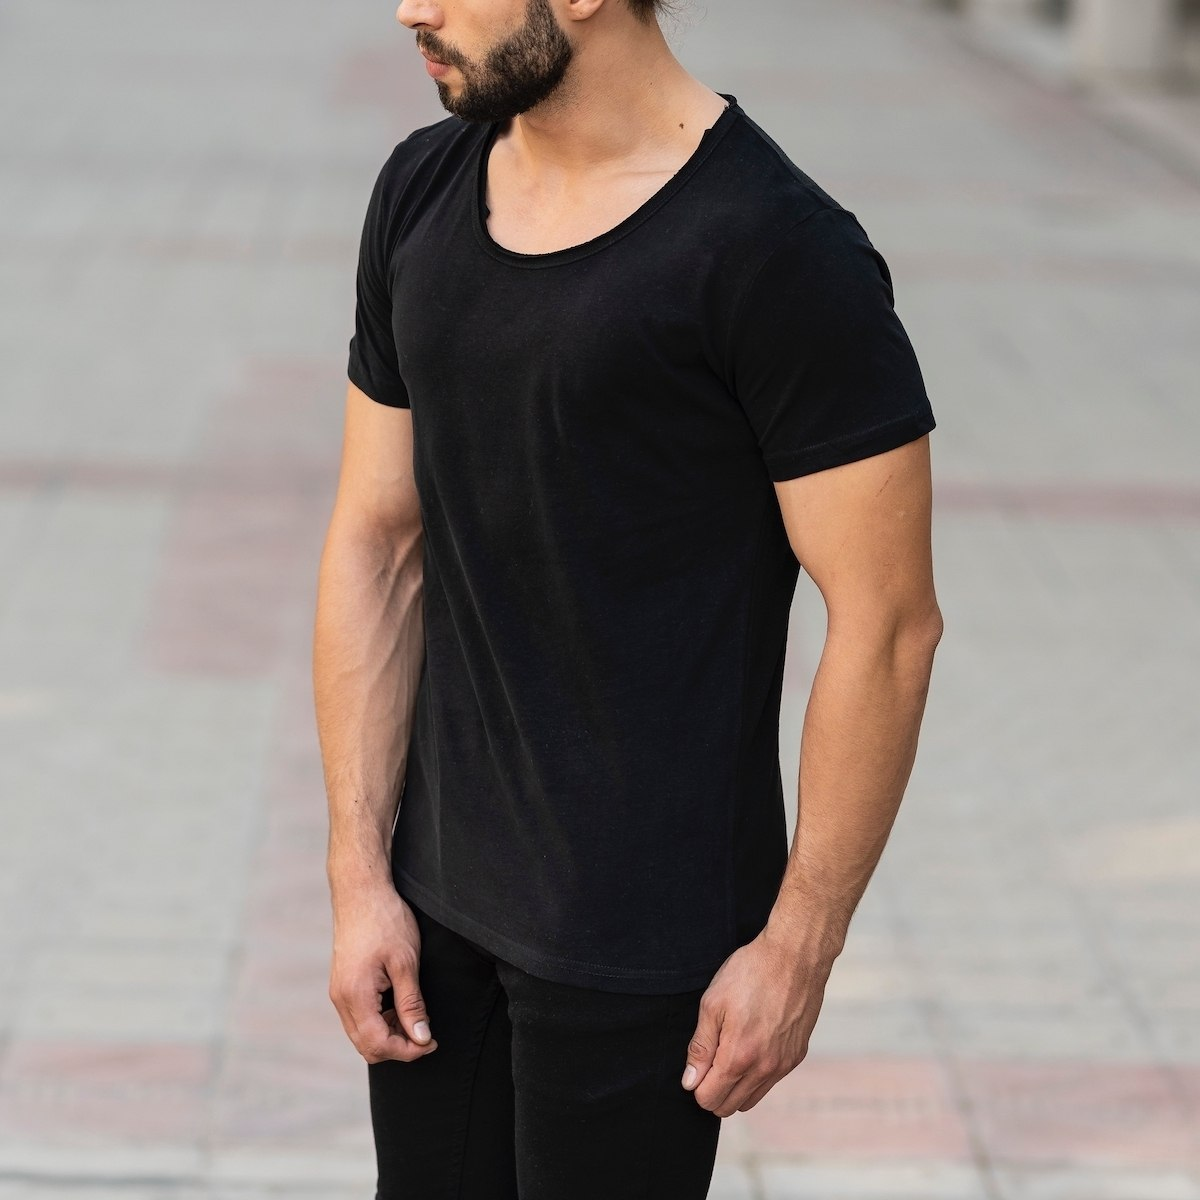 Croped Collar Black T-Shirt Mv Premium Brand - 3